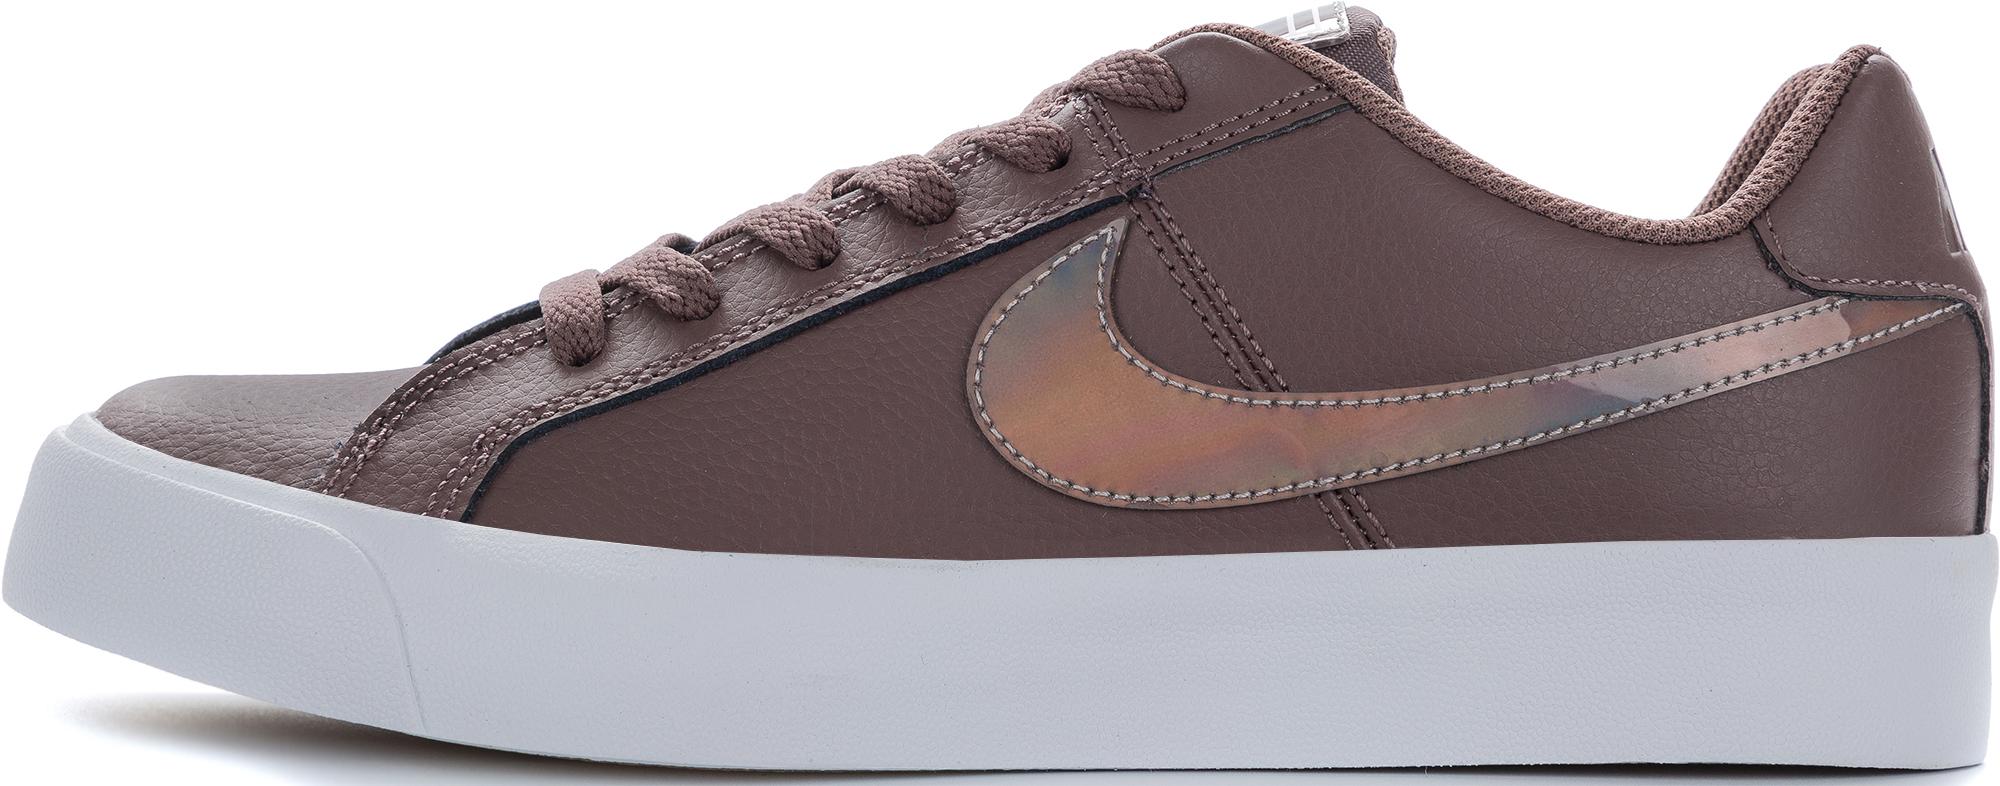 Nike Кеды женские Nike Court Royale AC, размер 39,5